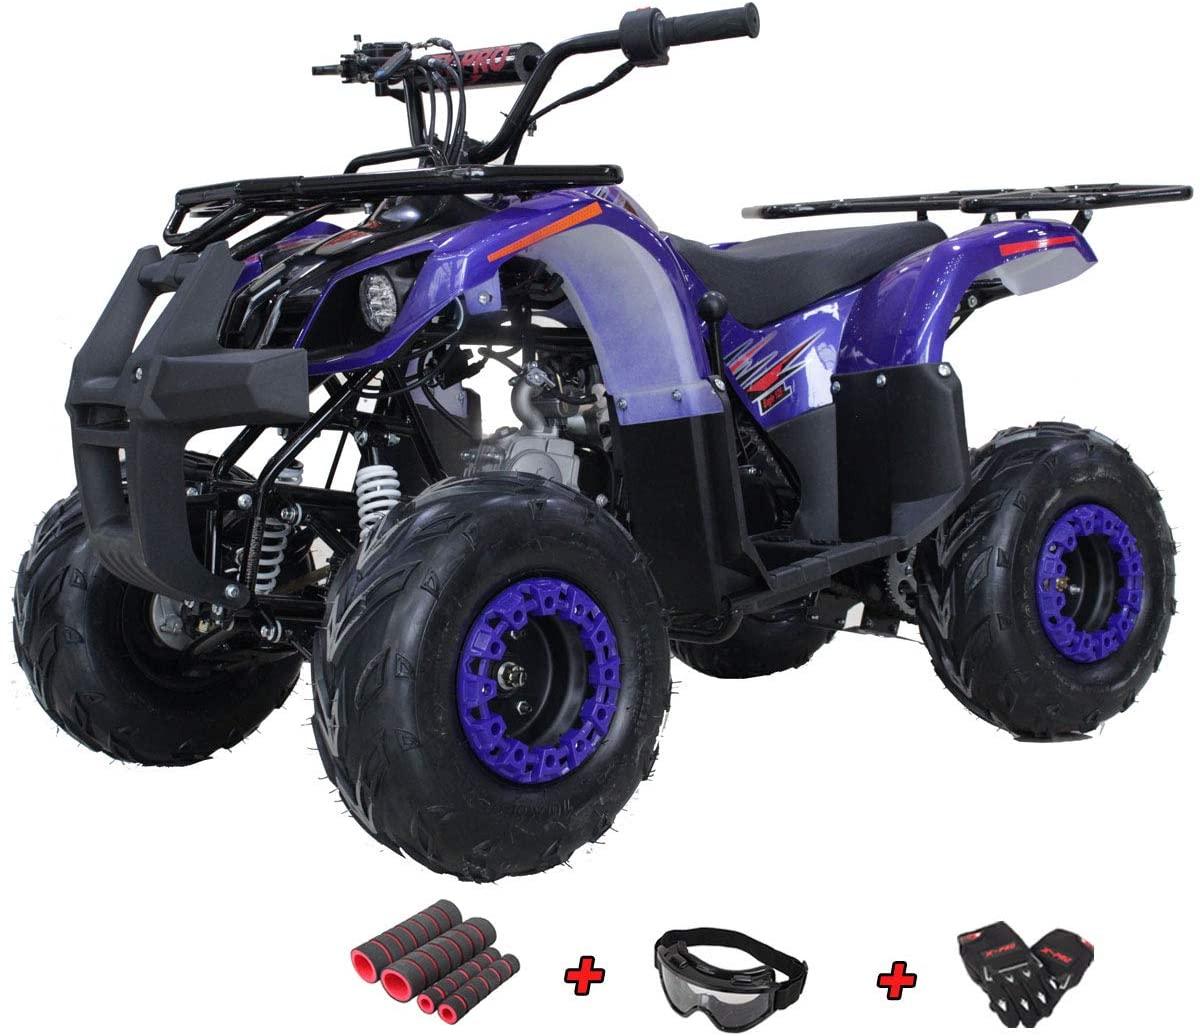 X-PRO Eagle 125 ATV Quad Youth 4 Wheeler ATVs Kid Size ATV 4 Wheelers 125cc Big Boys ATVs Quads with Gloves, Goggle and Handgrip (Blue)